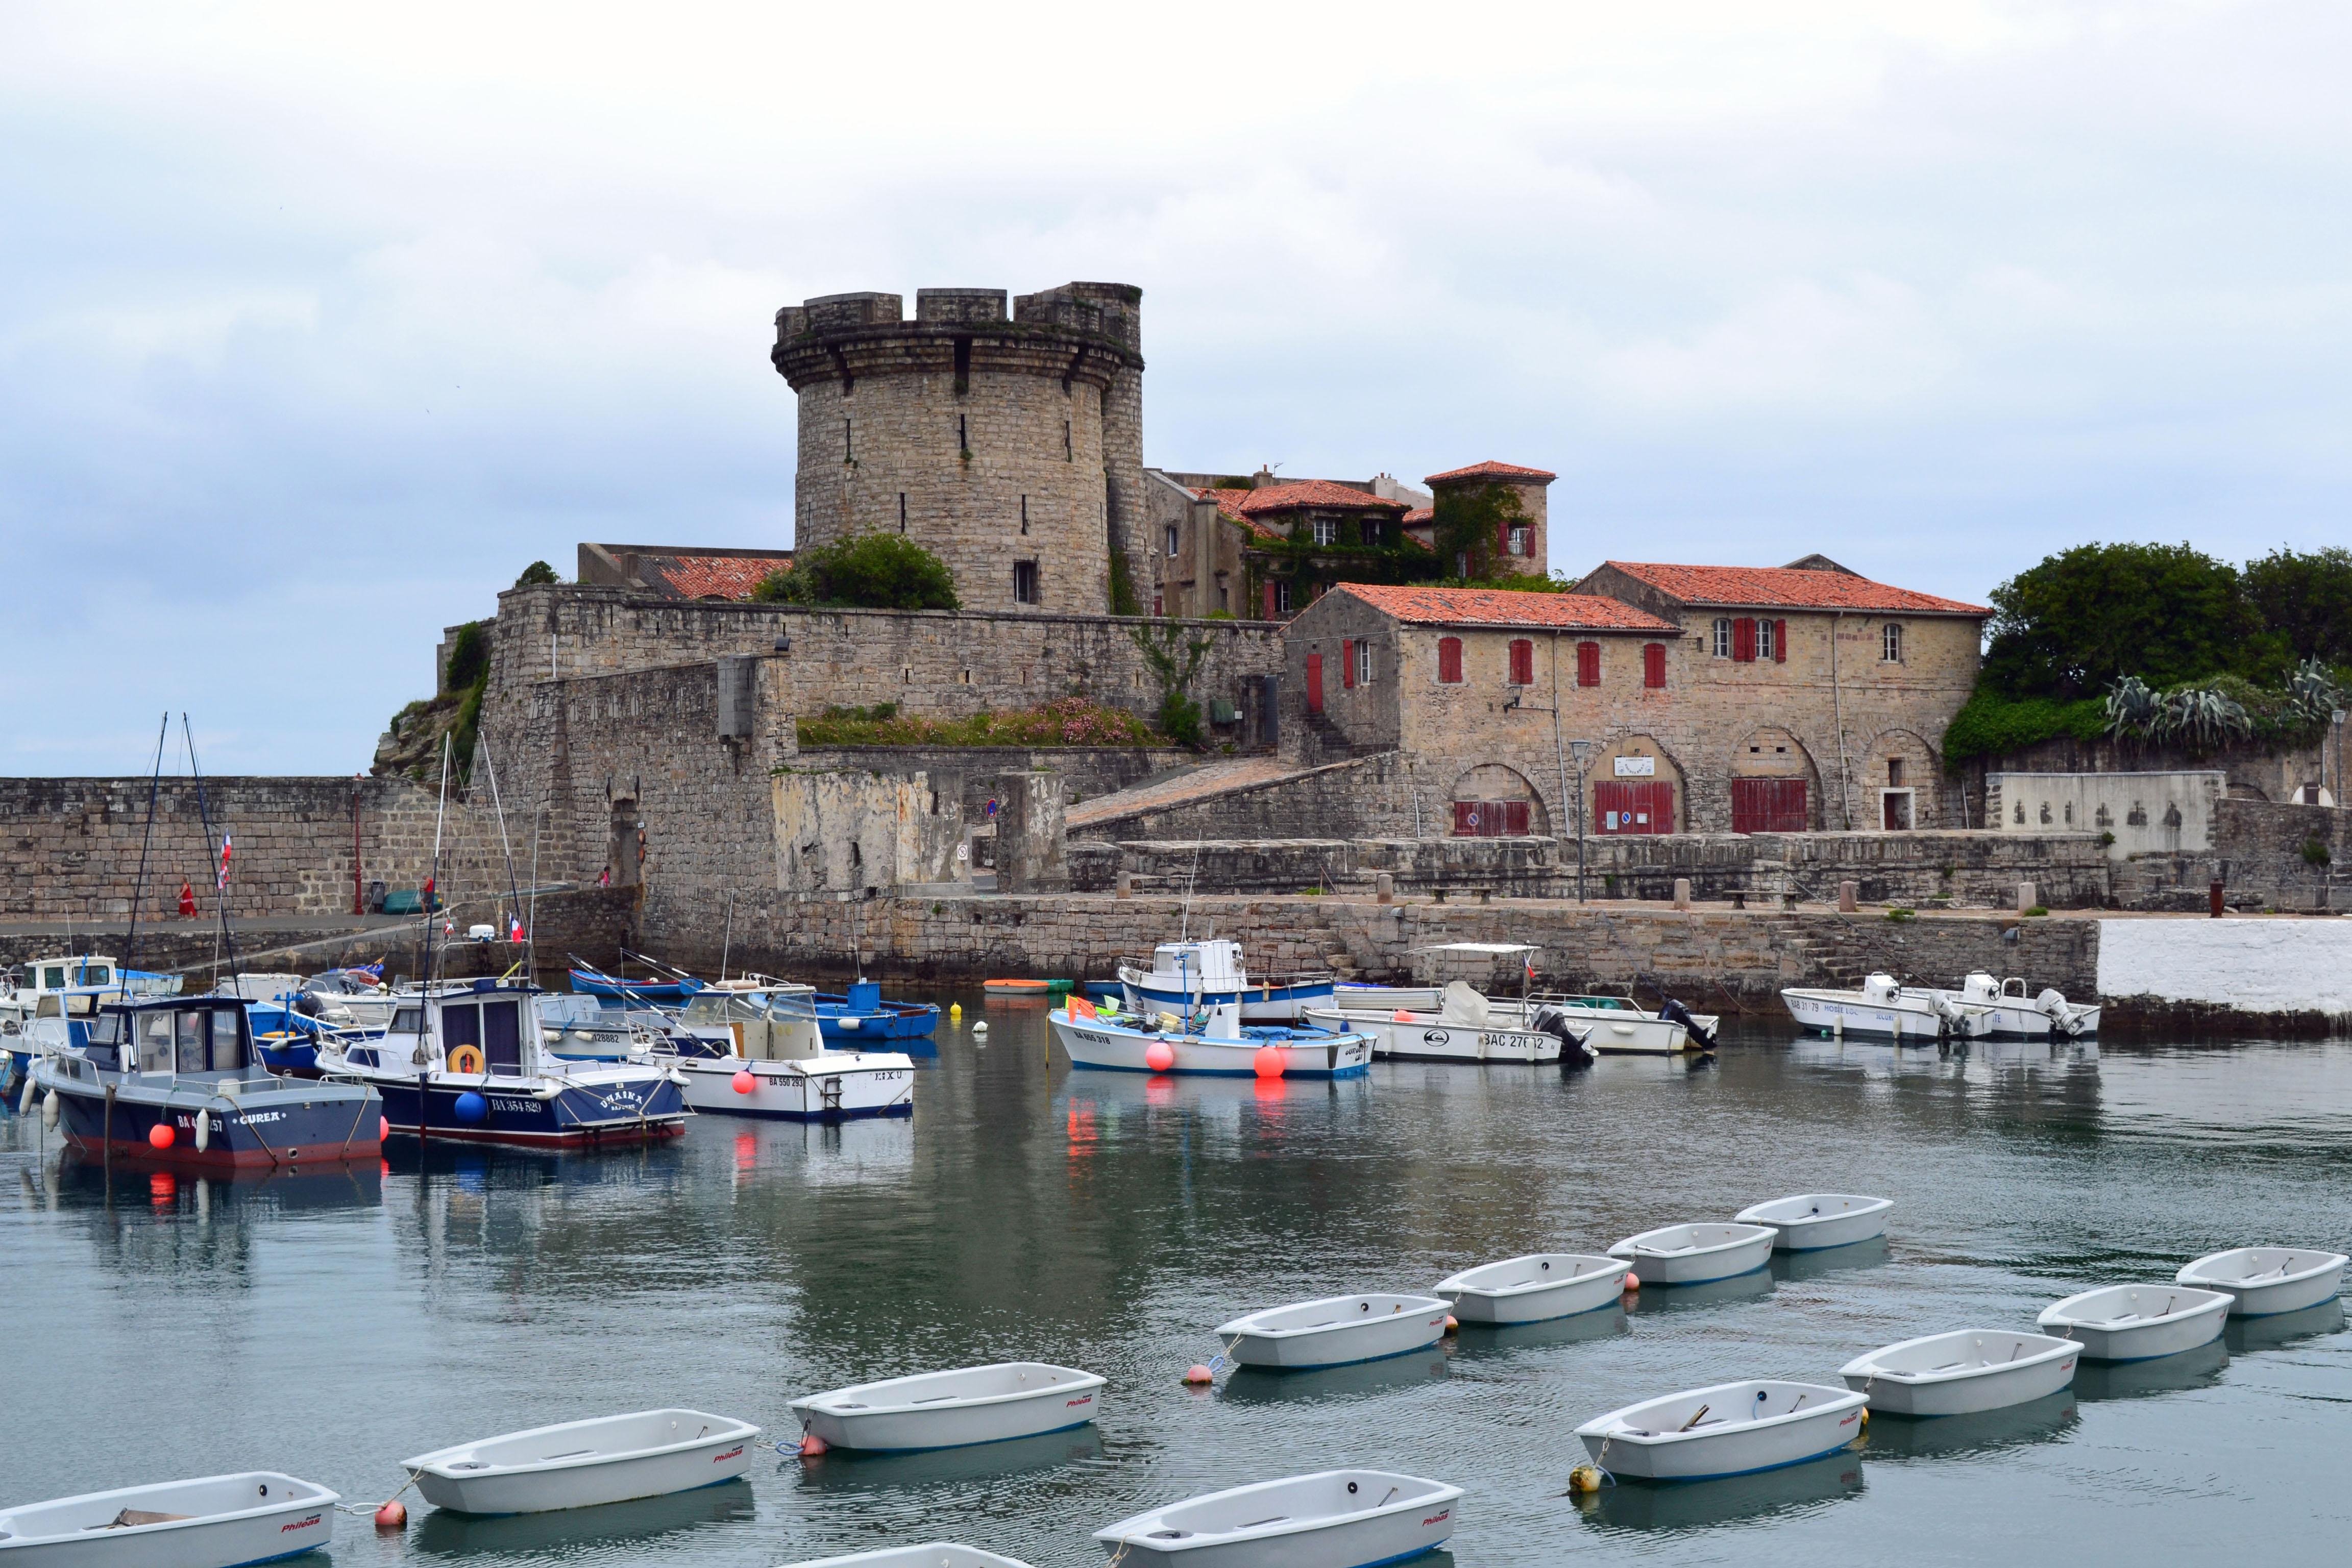 Le fort de socoa by aude la randonneuse on deviantart - Fort de socoa ...